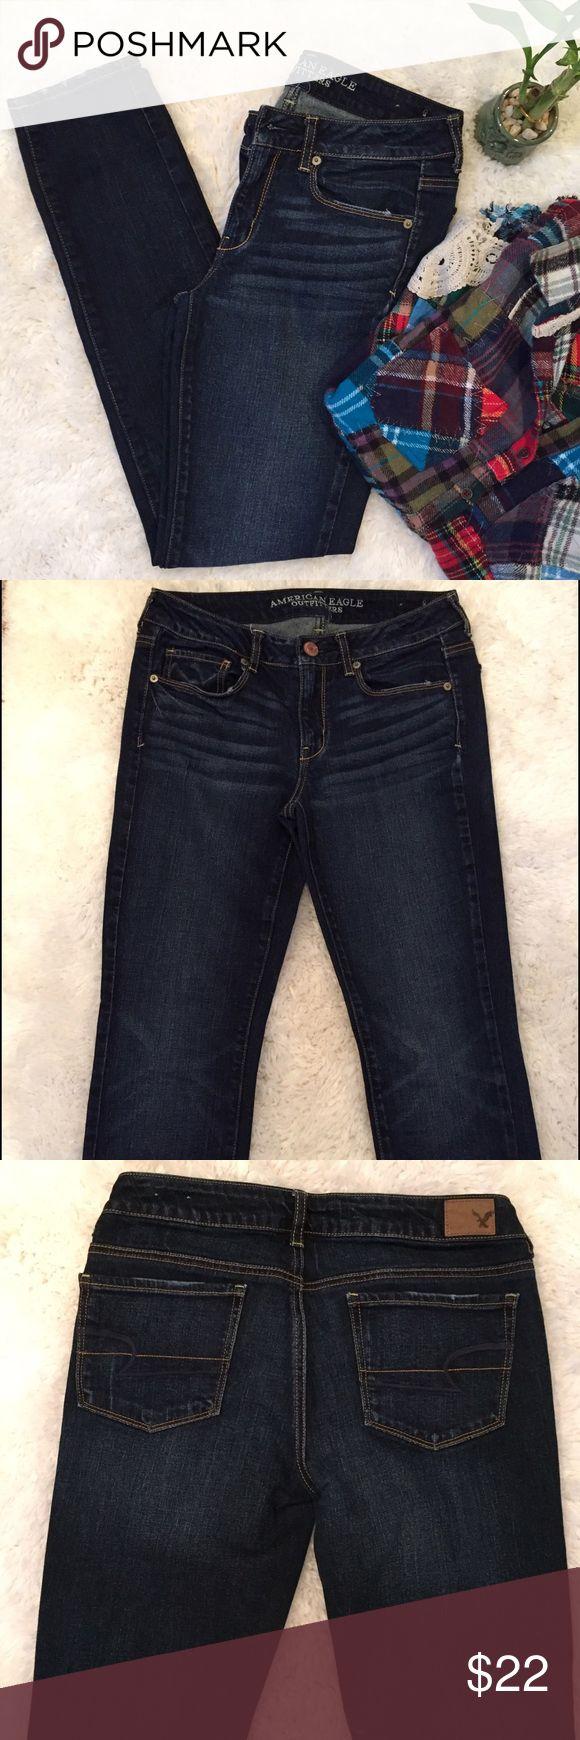 American Eagle Skinny Jeans American Eagle Skinny Jeans   Like New   Size 6 American Eagle Outfitters Jeans Skinny